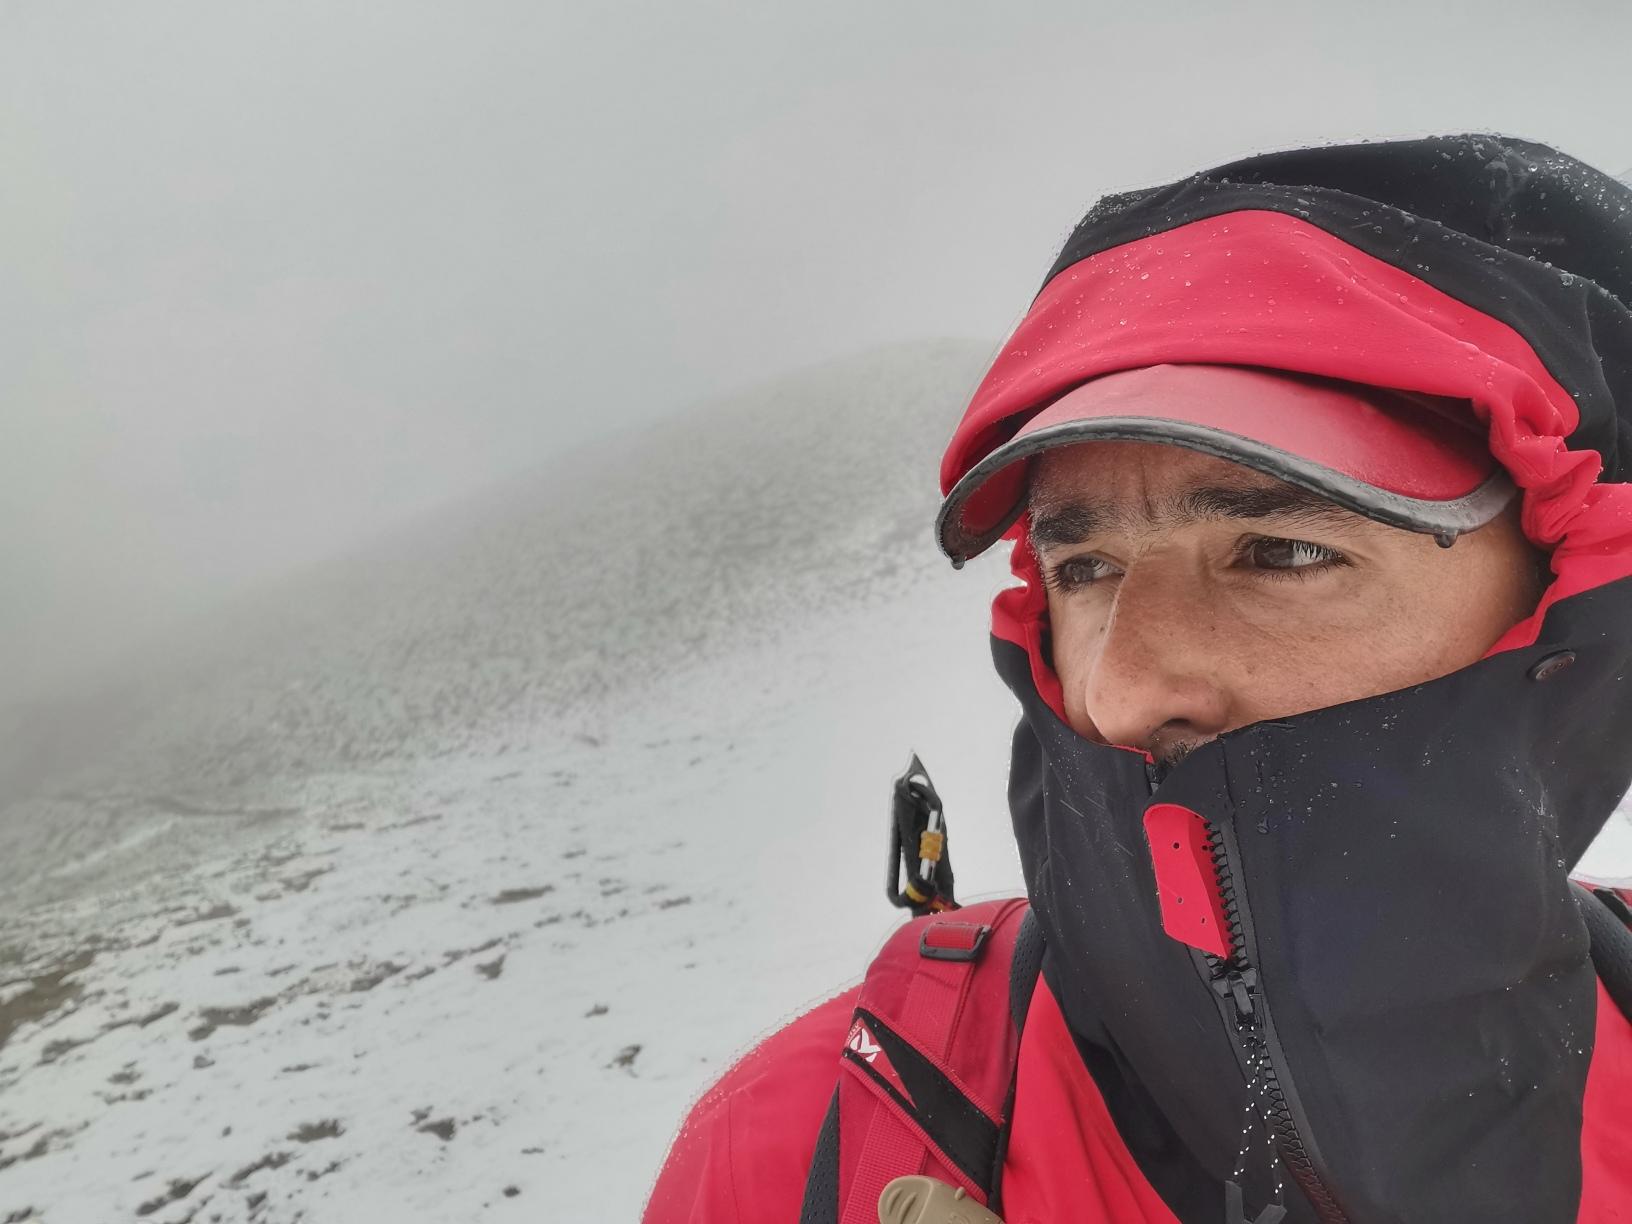 The North Face Summit L5 Futurelight